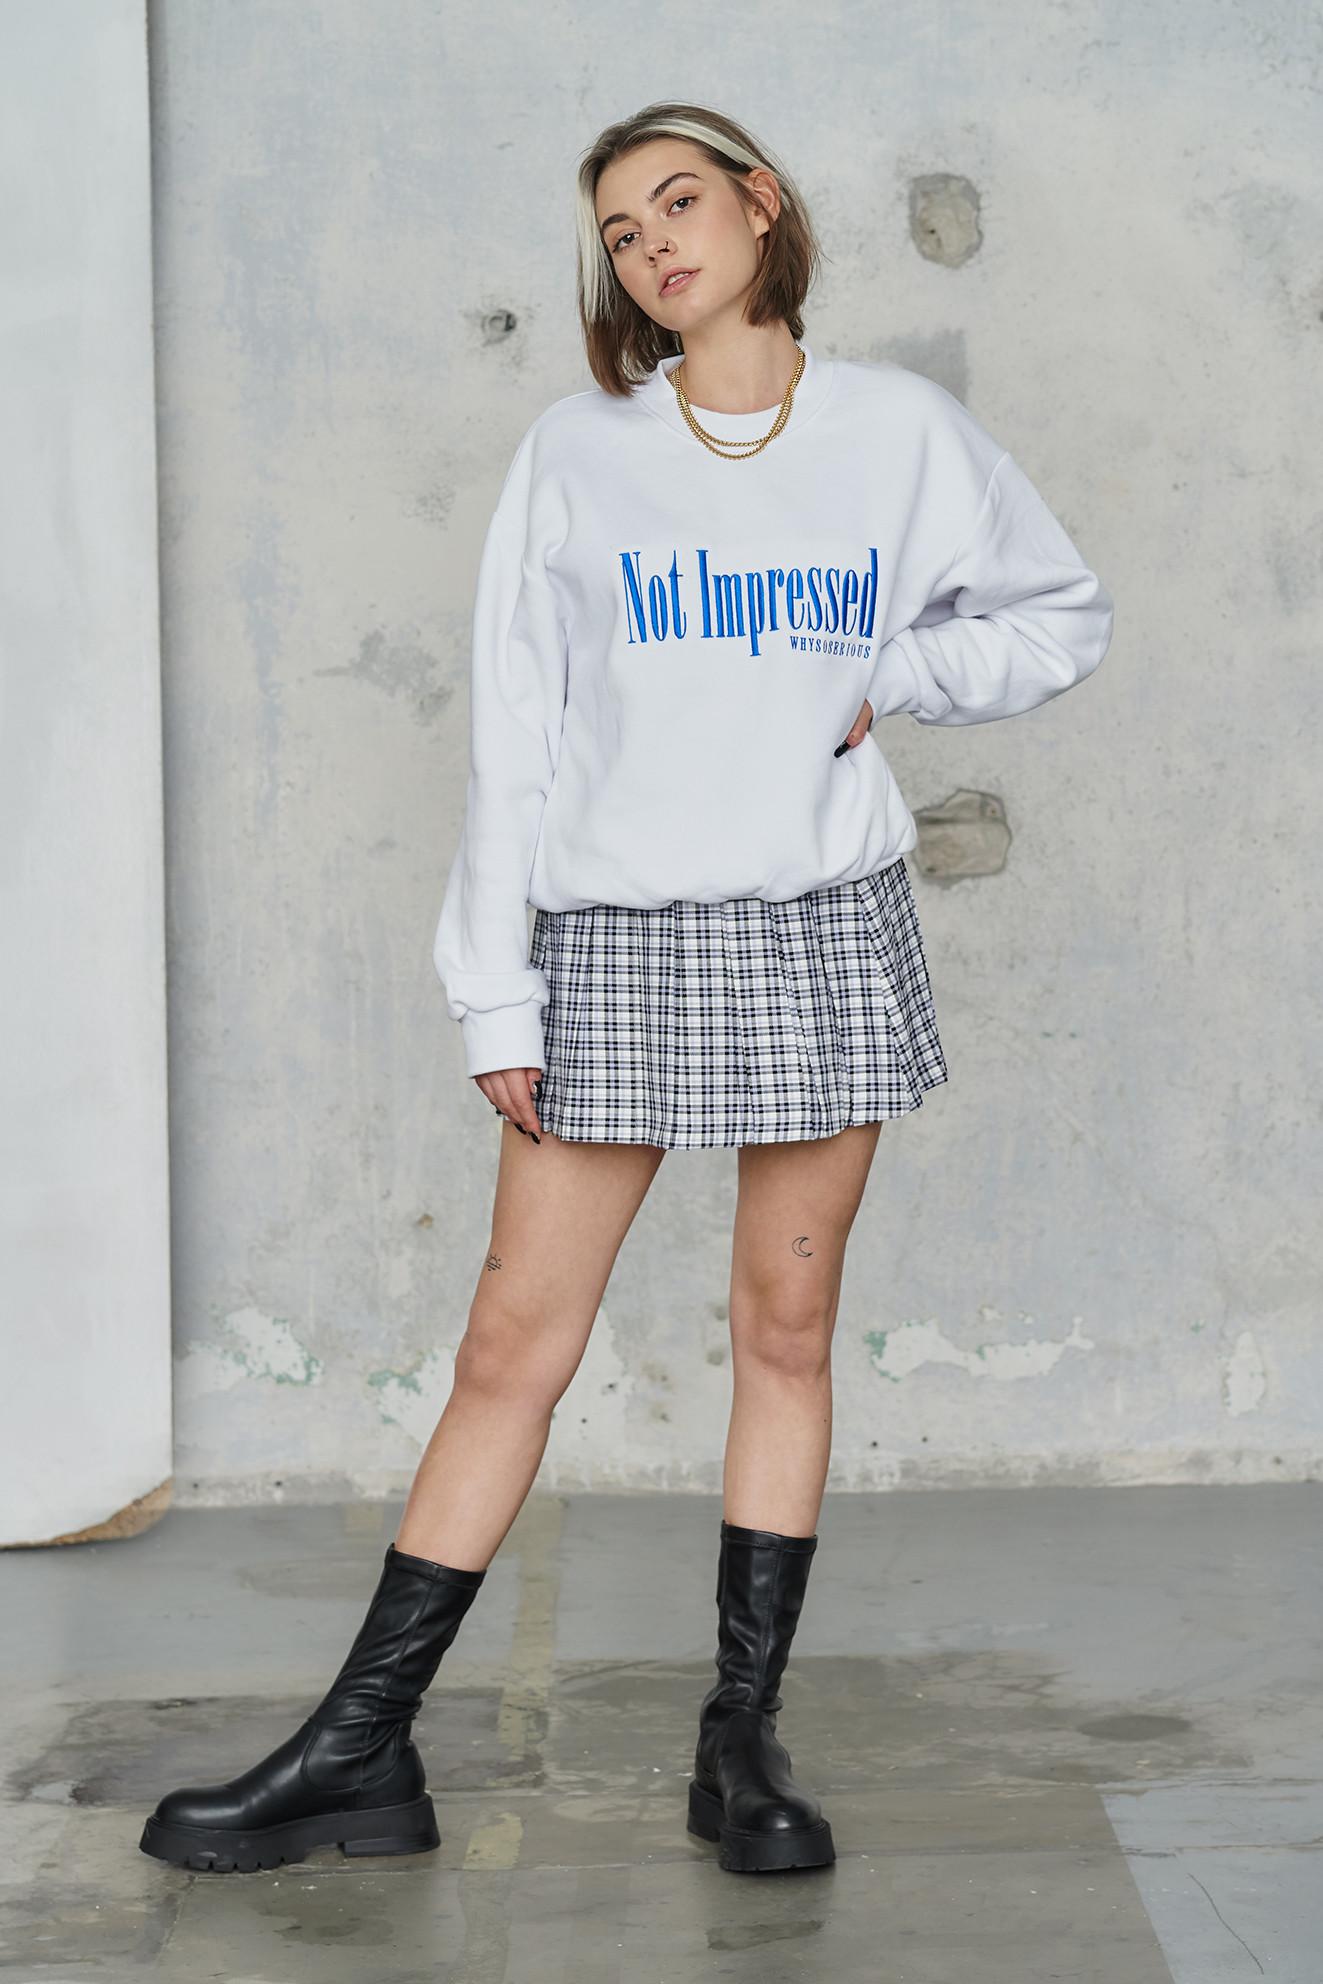 Not Impressed Sweatshirt - whysoserious | JestemSlow.pl